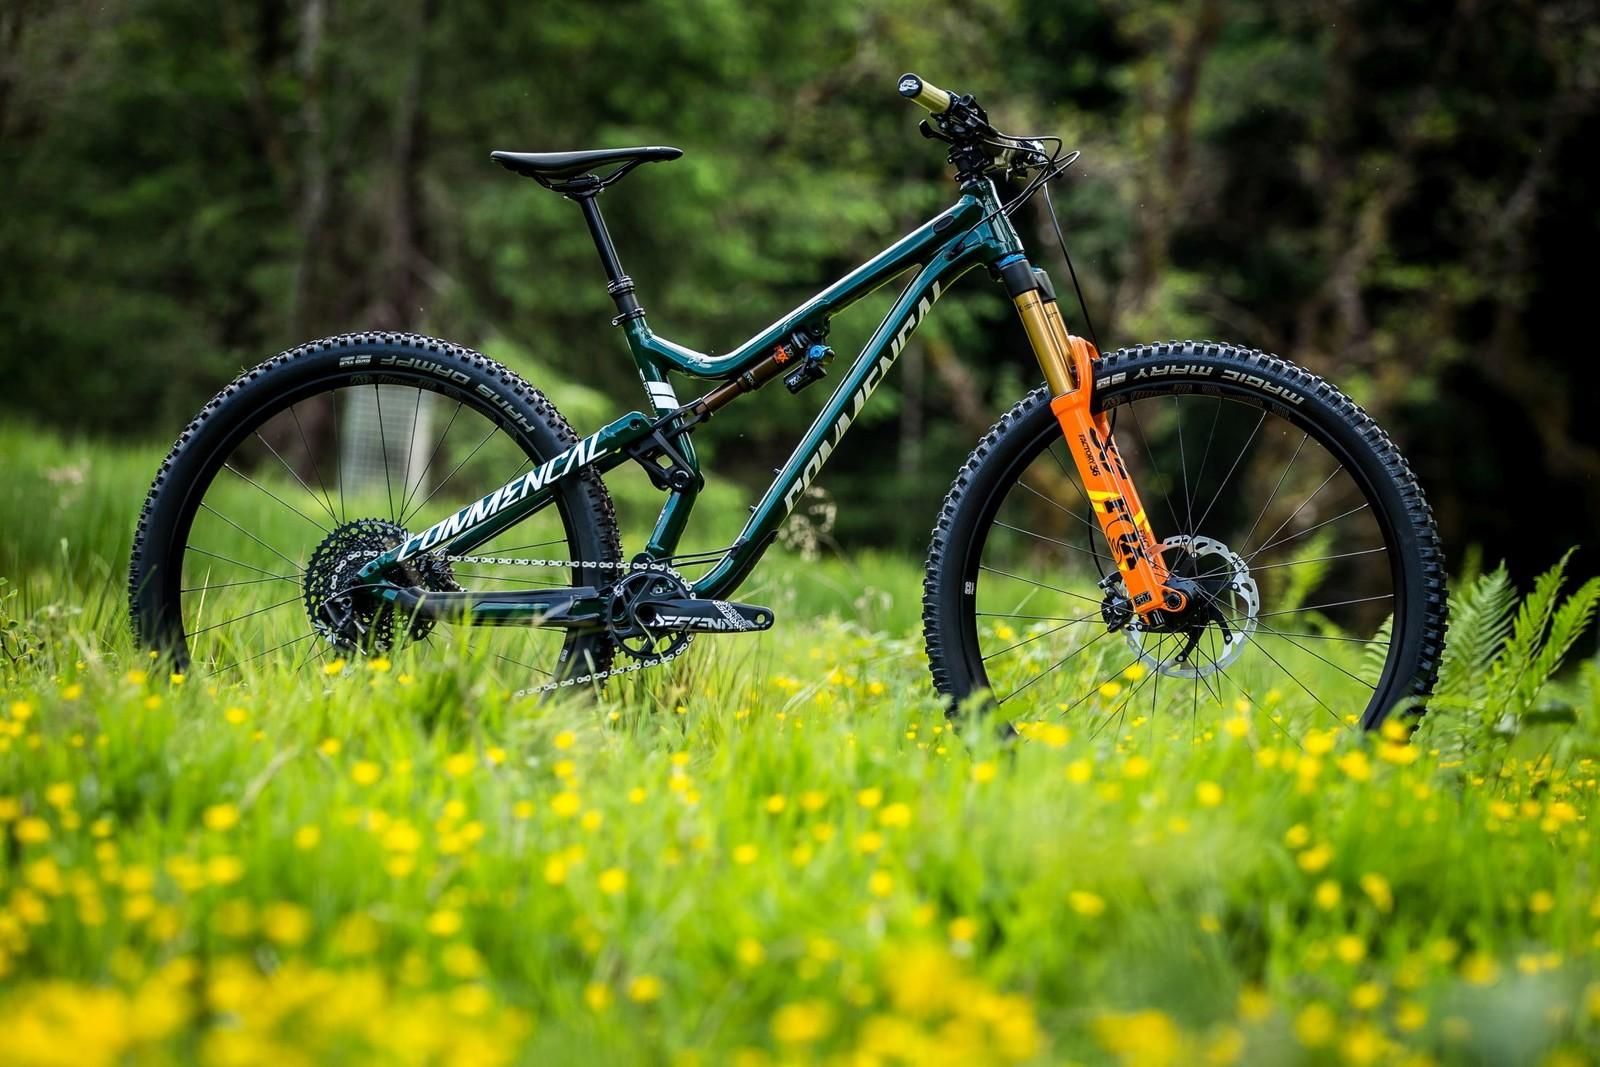 FW18 AN3X7452 - Commencal Meta TR 29 - Mountain Biking Pictures - Vital MTB